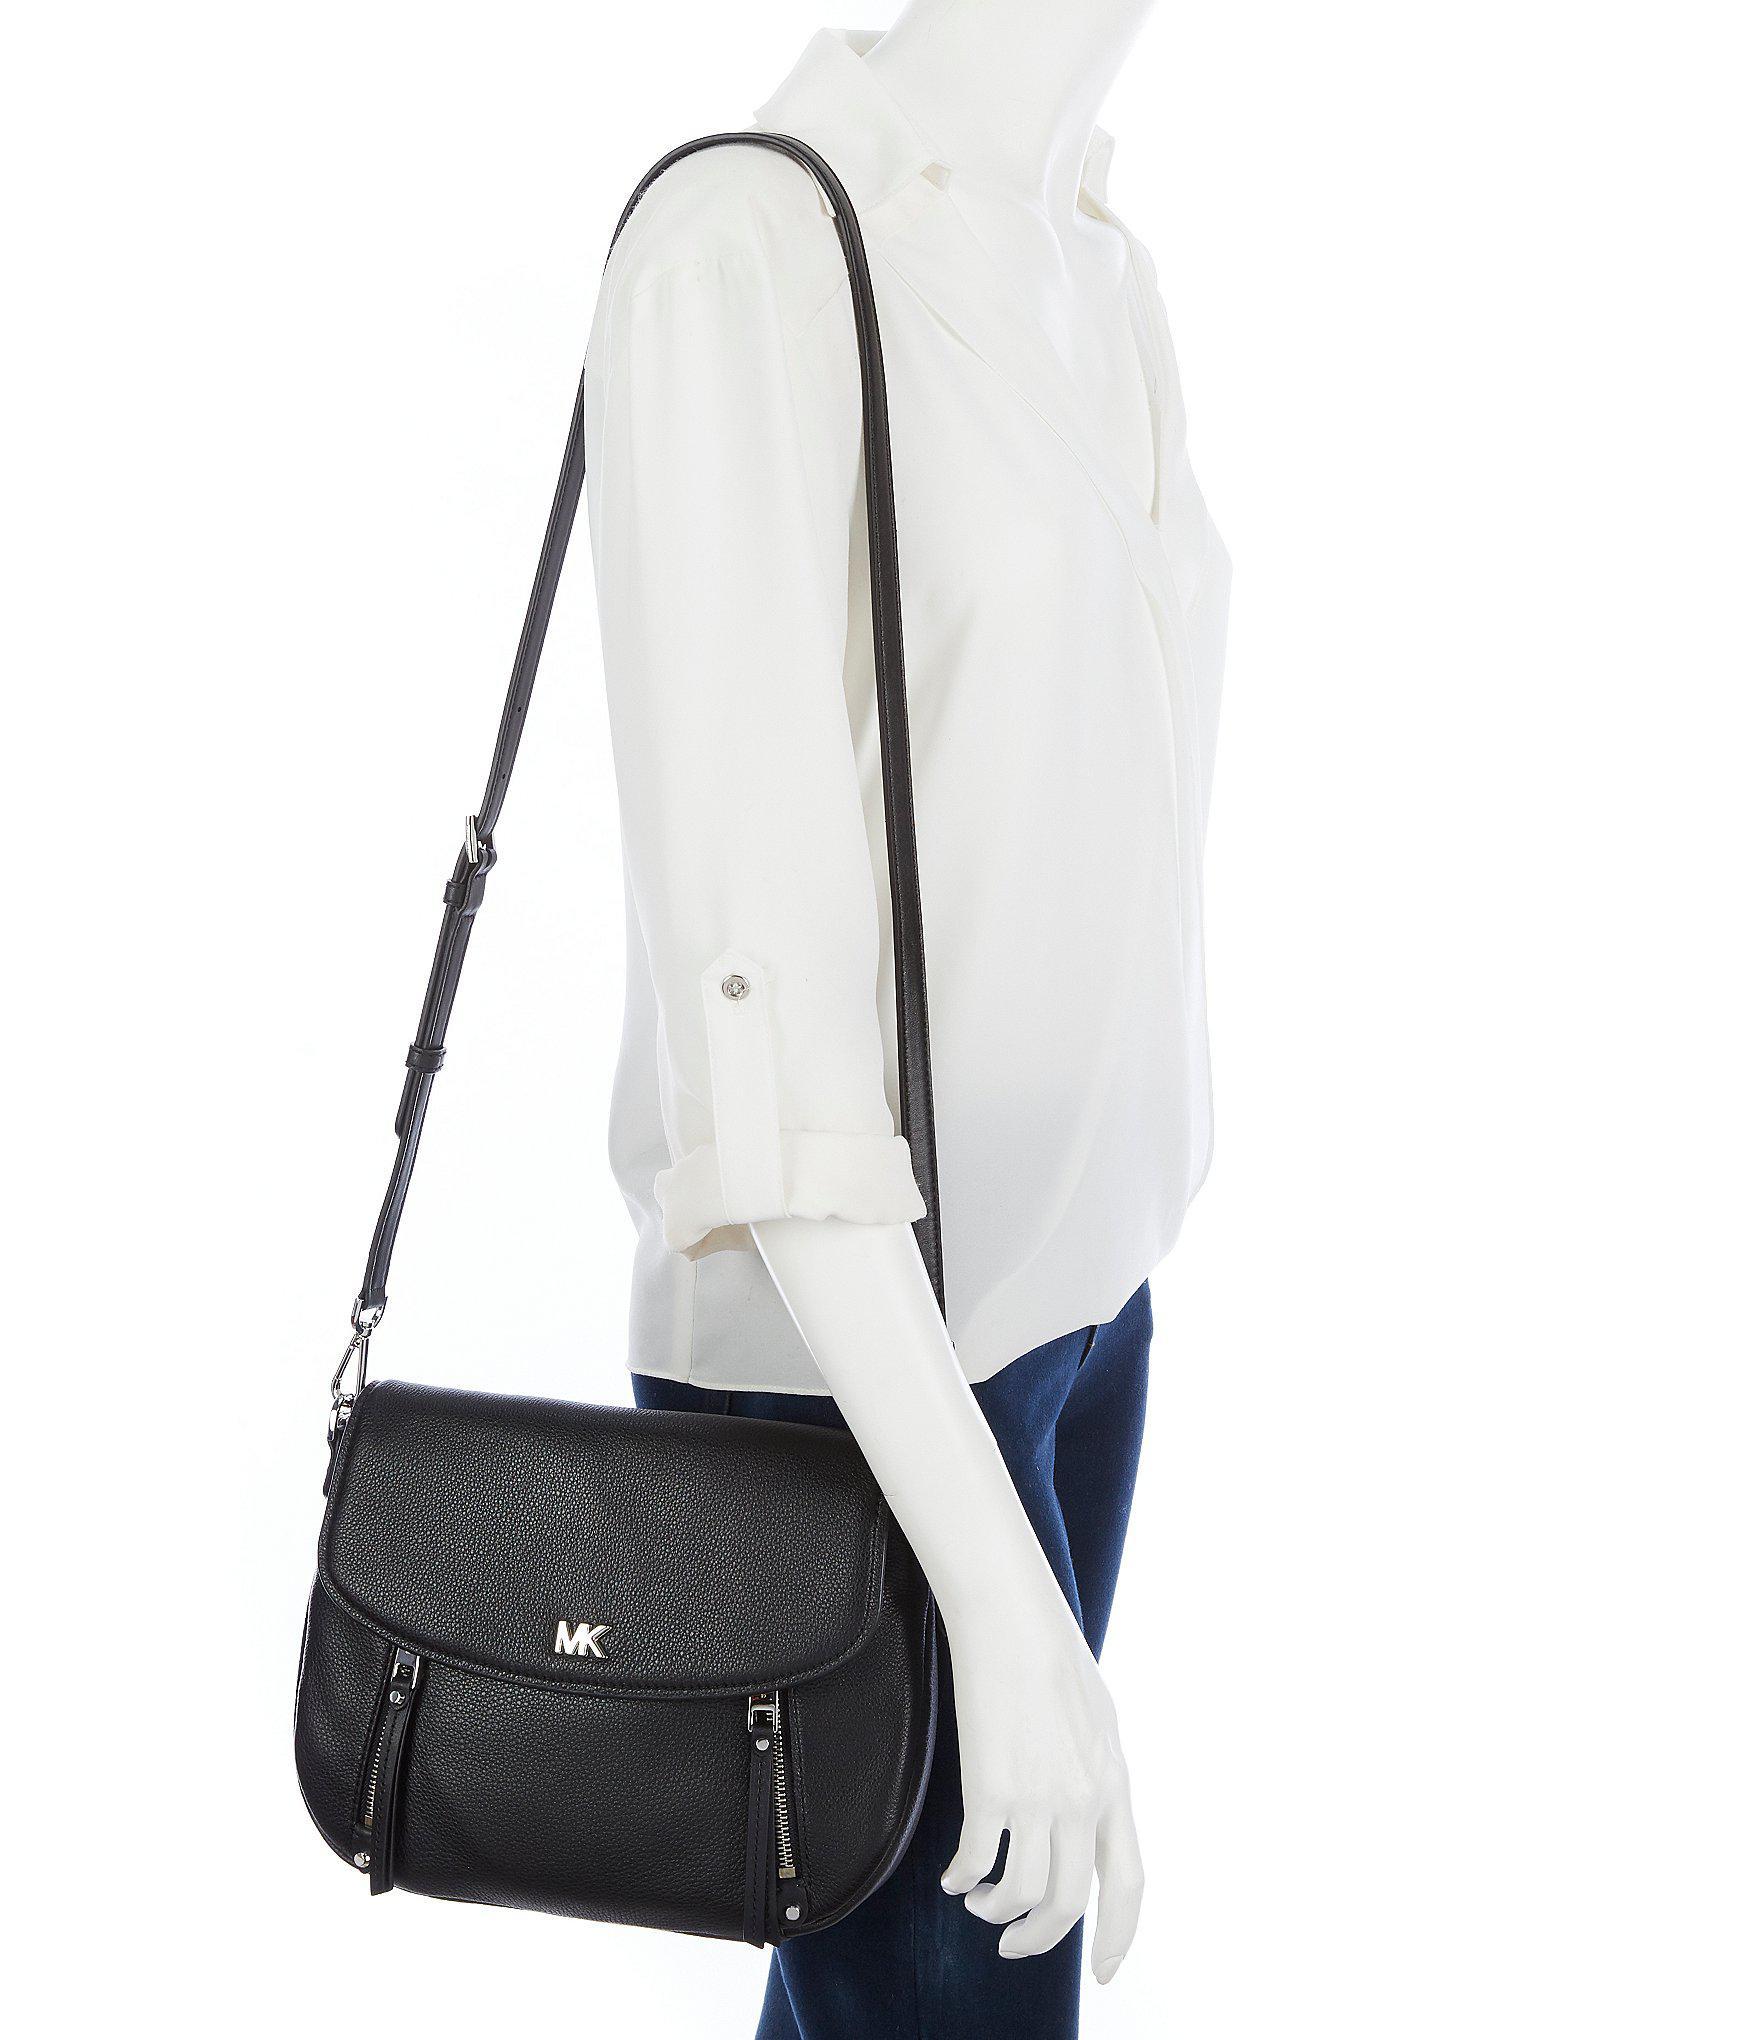 6be2edcf187481 MICHAEL Michael Kors Evie Medium Shoulder Bag in Black - Lyst